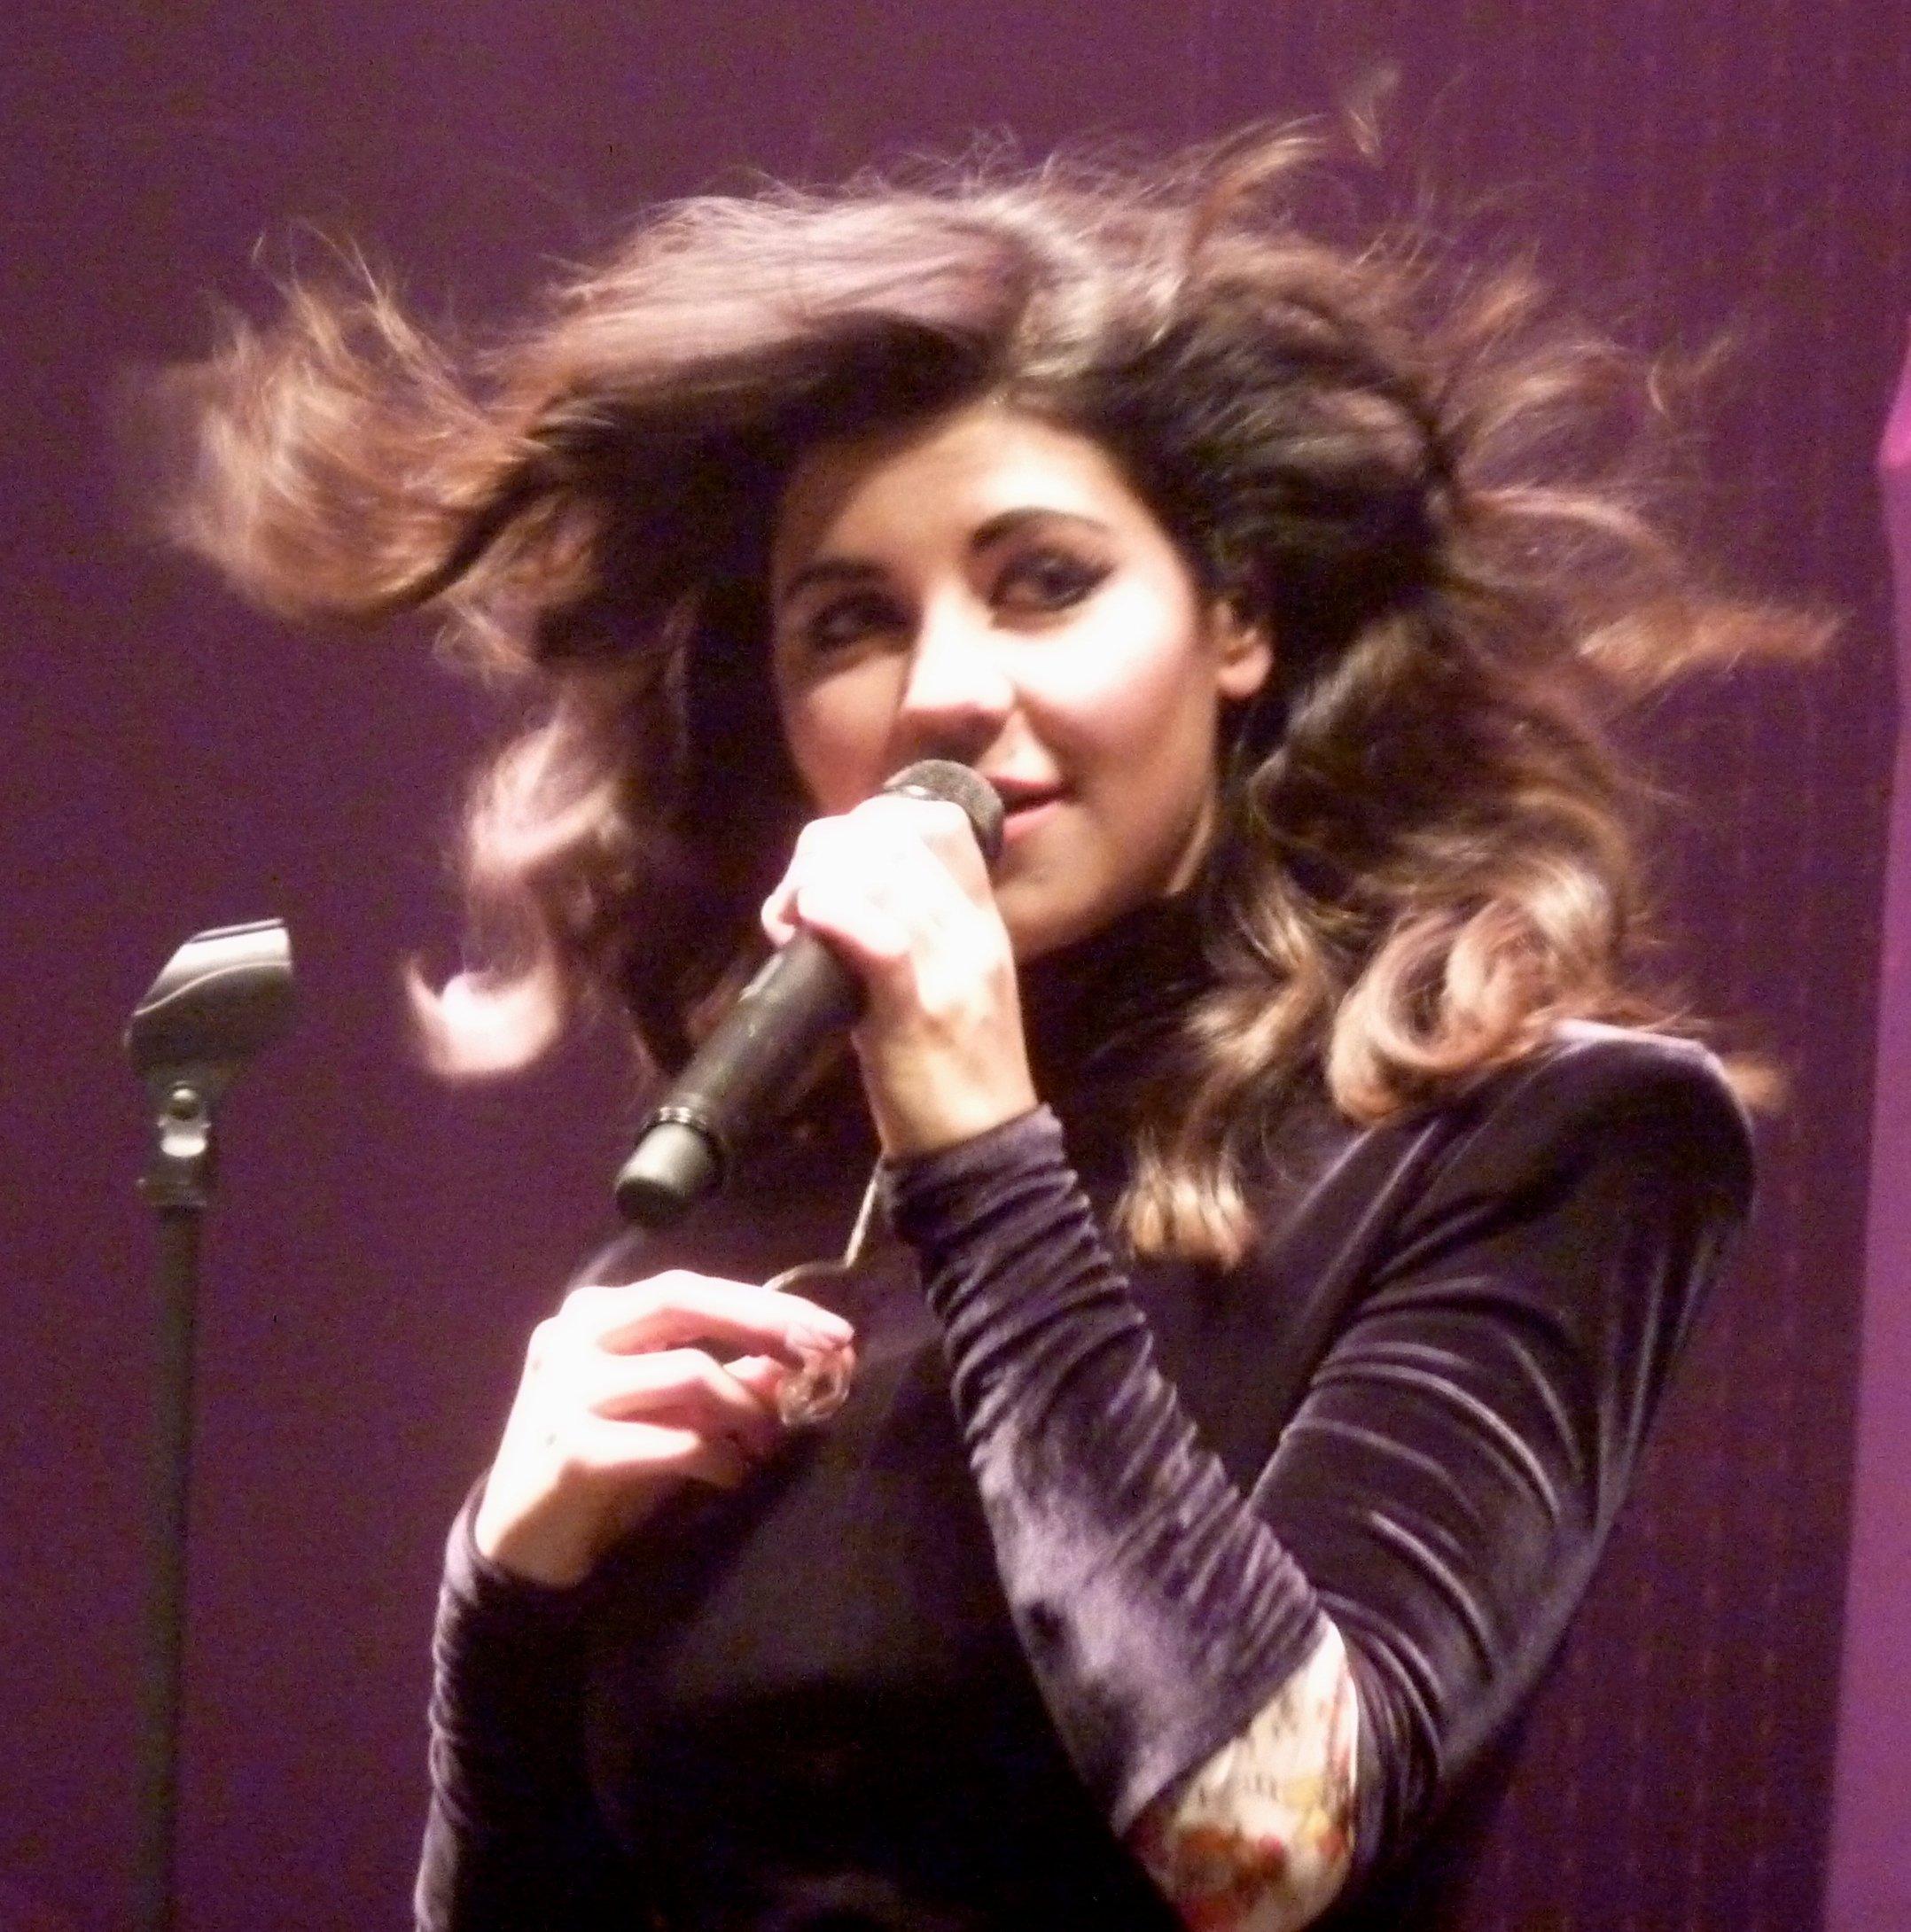 Photo of musical artist MARINA